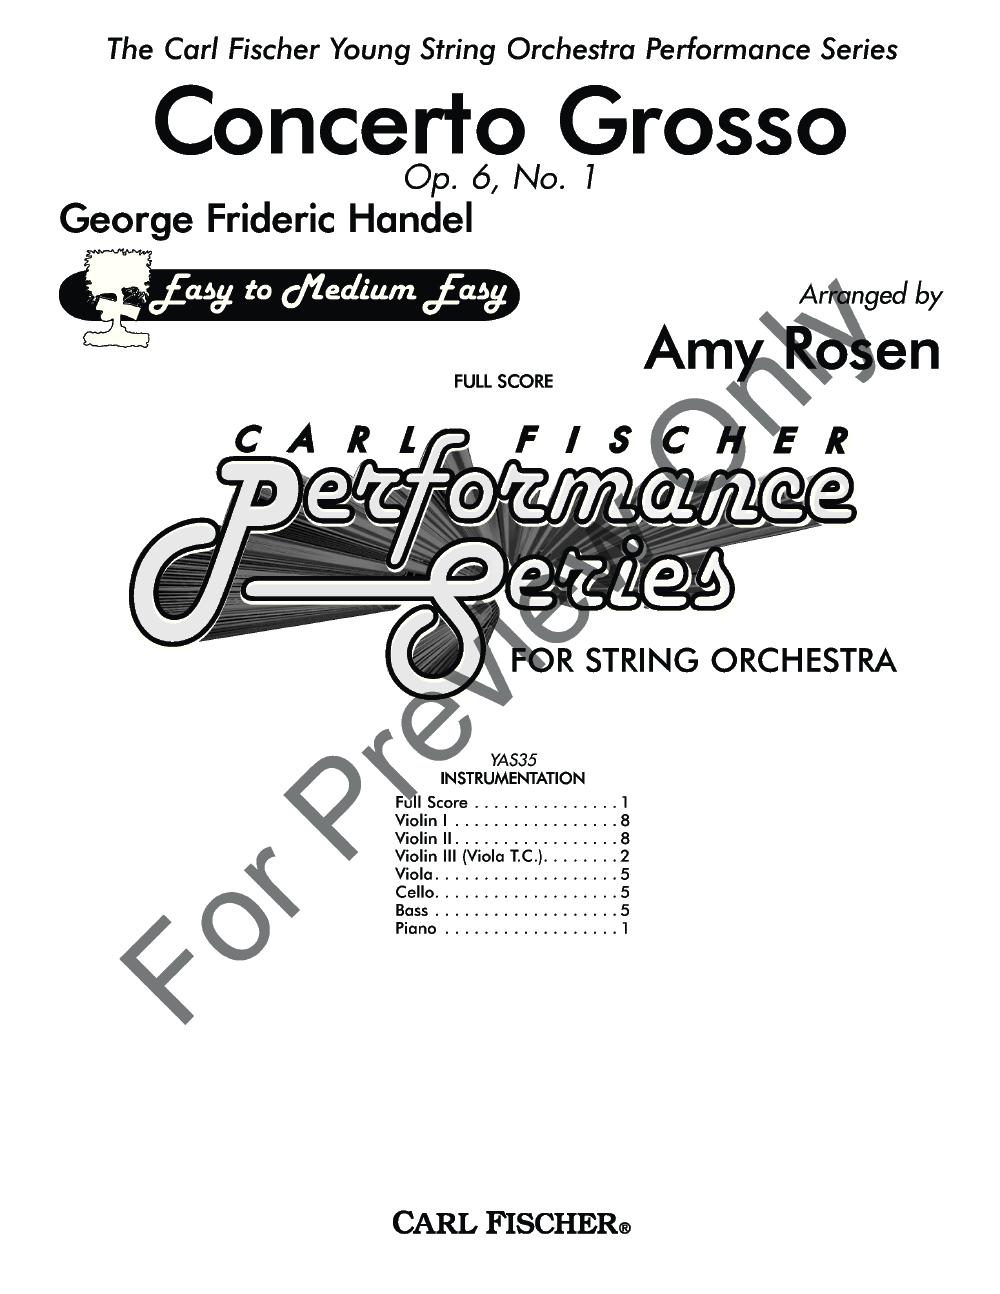 Concerto Grosso by G. F. Handel/arr. Rosen| J.W. Pepper